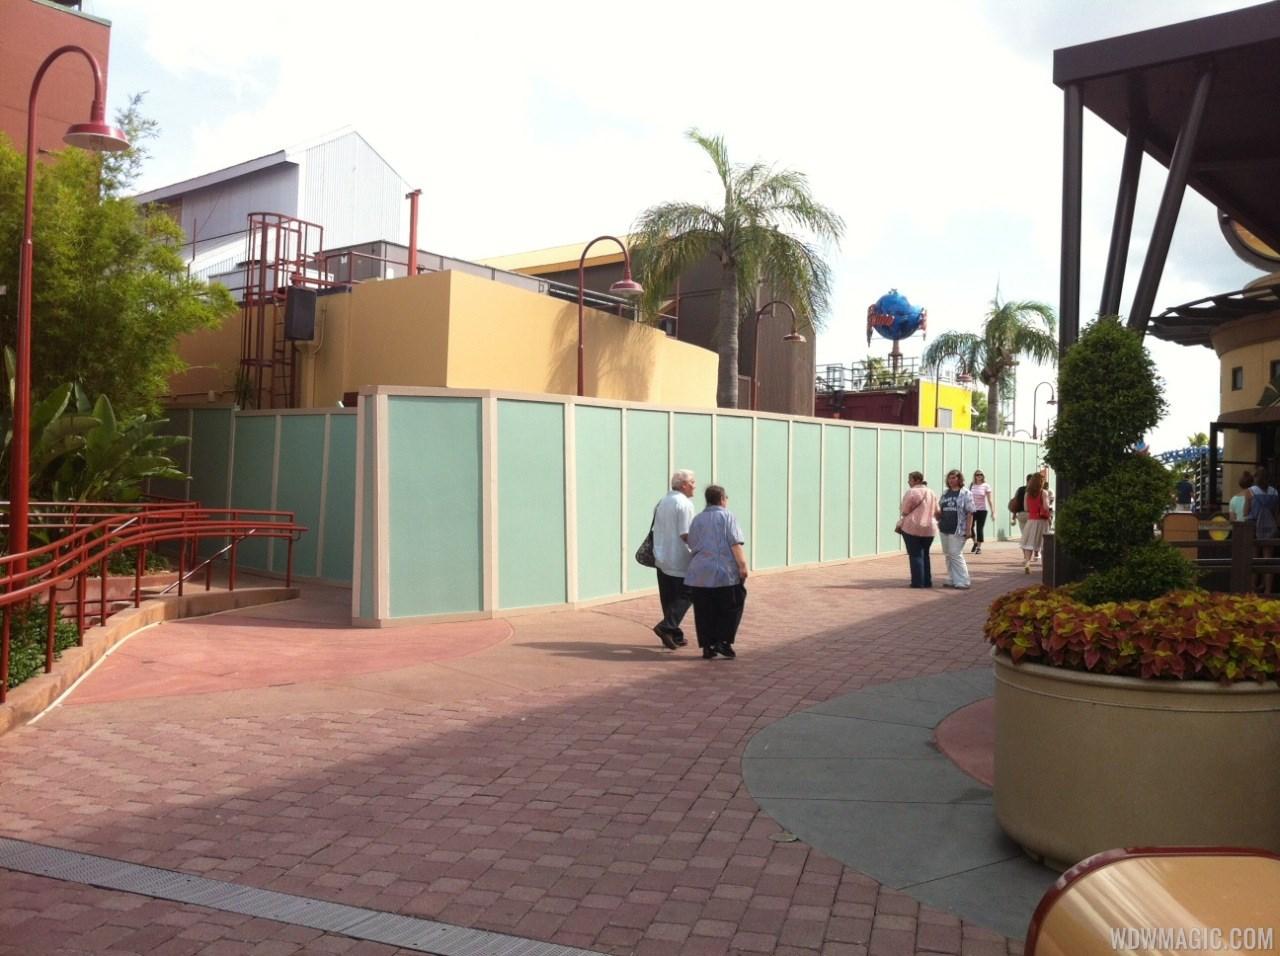 Disney Springs construction walls around more of Pleasure Island